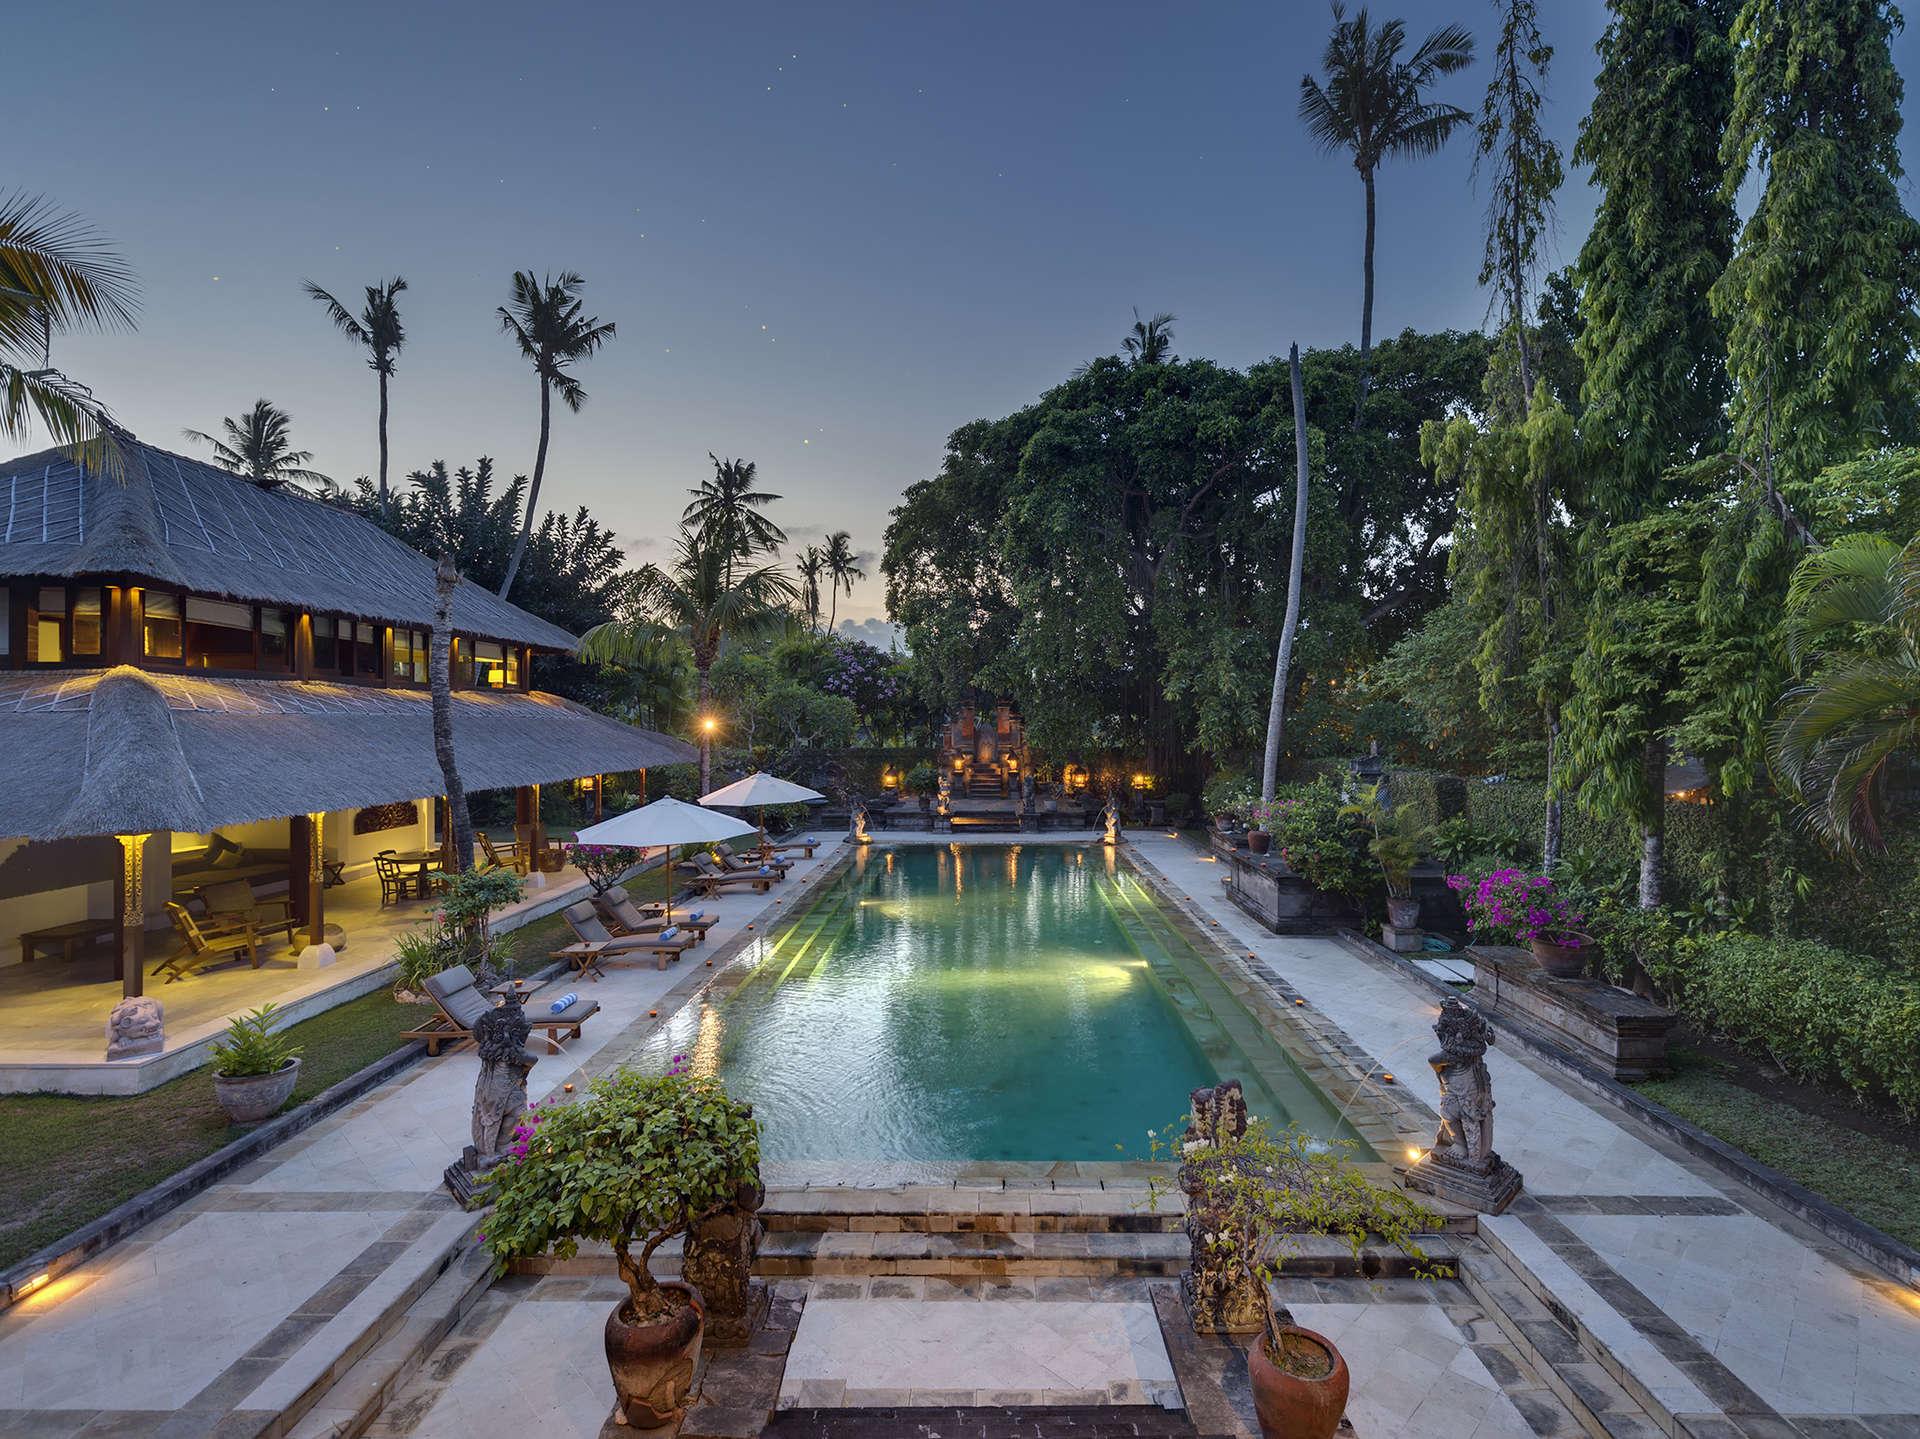 Luxury villa rentals asia - Indonesia - Bali - Sanur - Batujimbar - Image 1/21